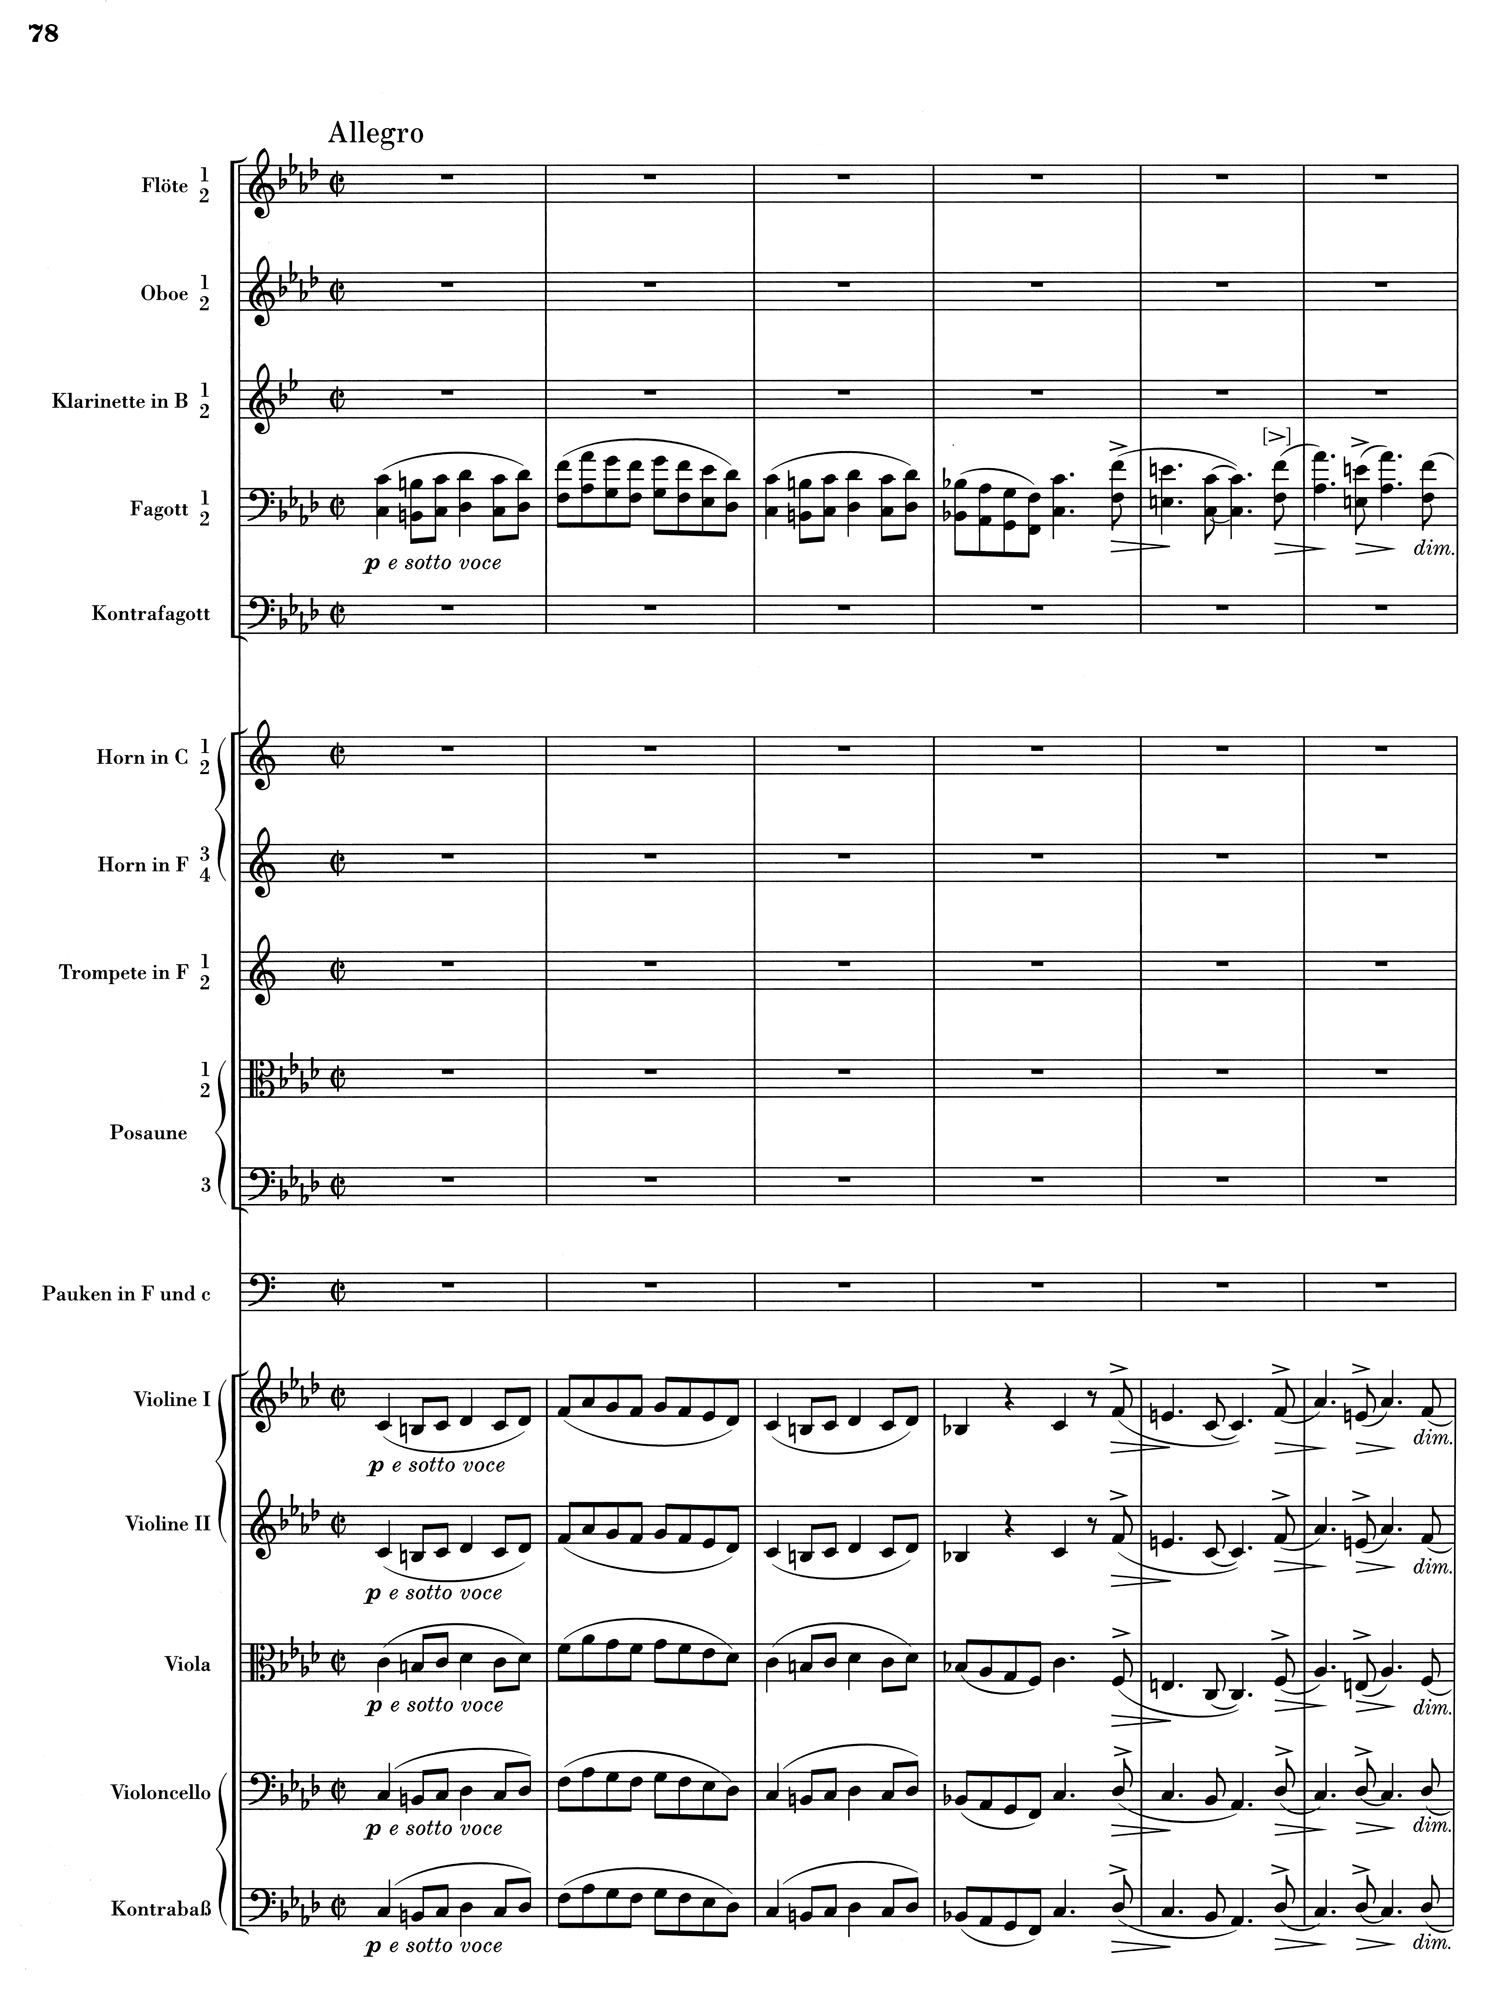 Brahms 3 Score 7.jpg